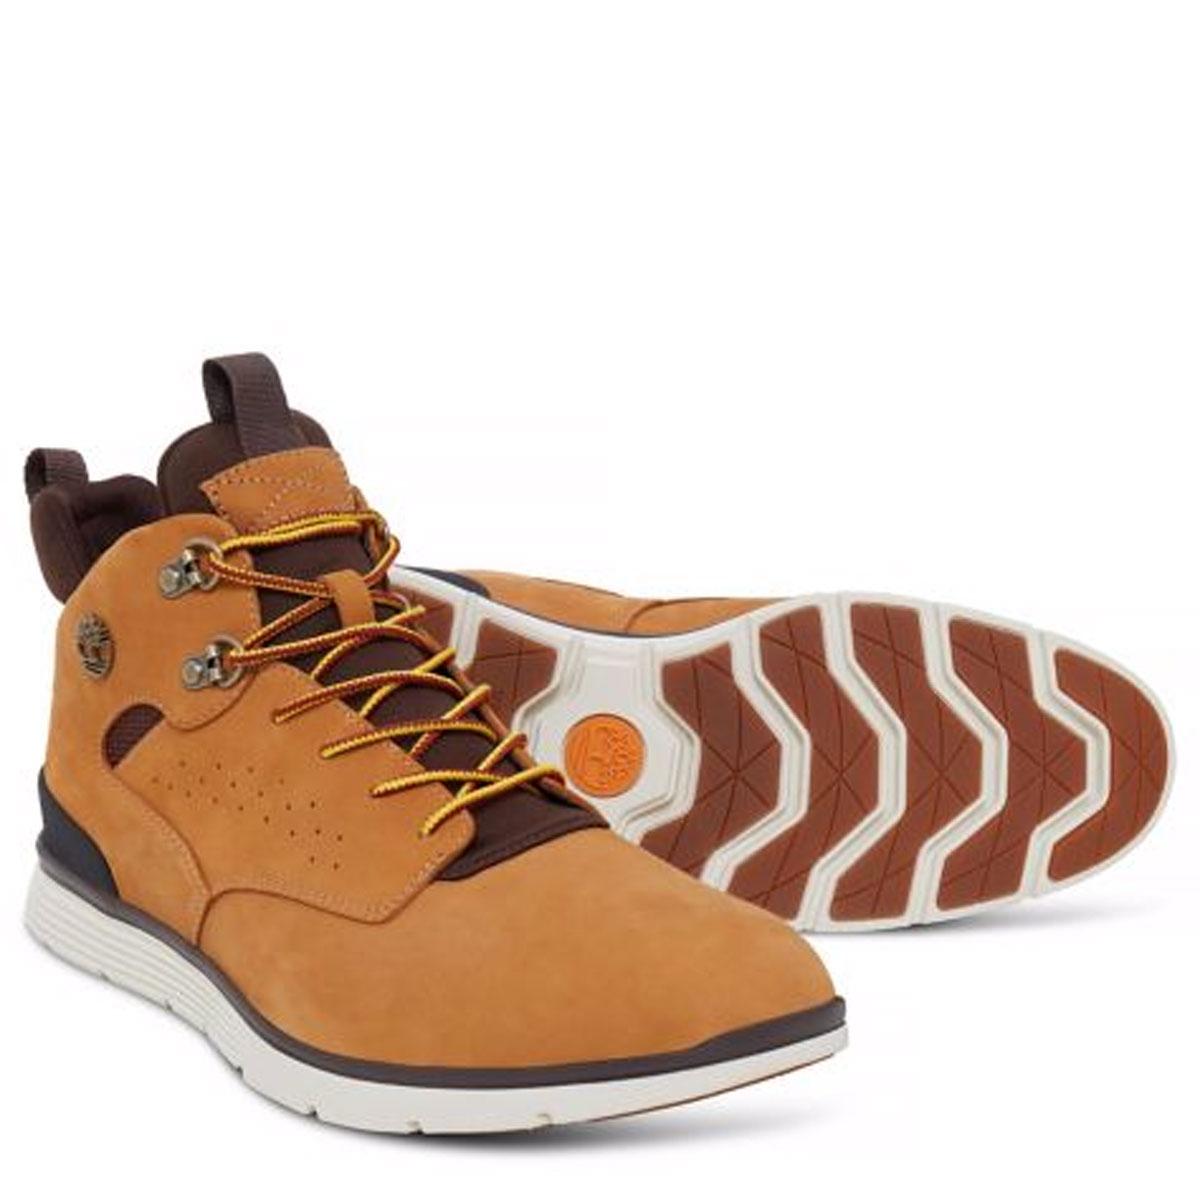 ca9a3203a99d ... Image of Timberland Killington Hiker Chukka Casual Boots (Men s) -  Wheat Nubuck ...